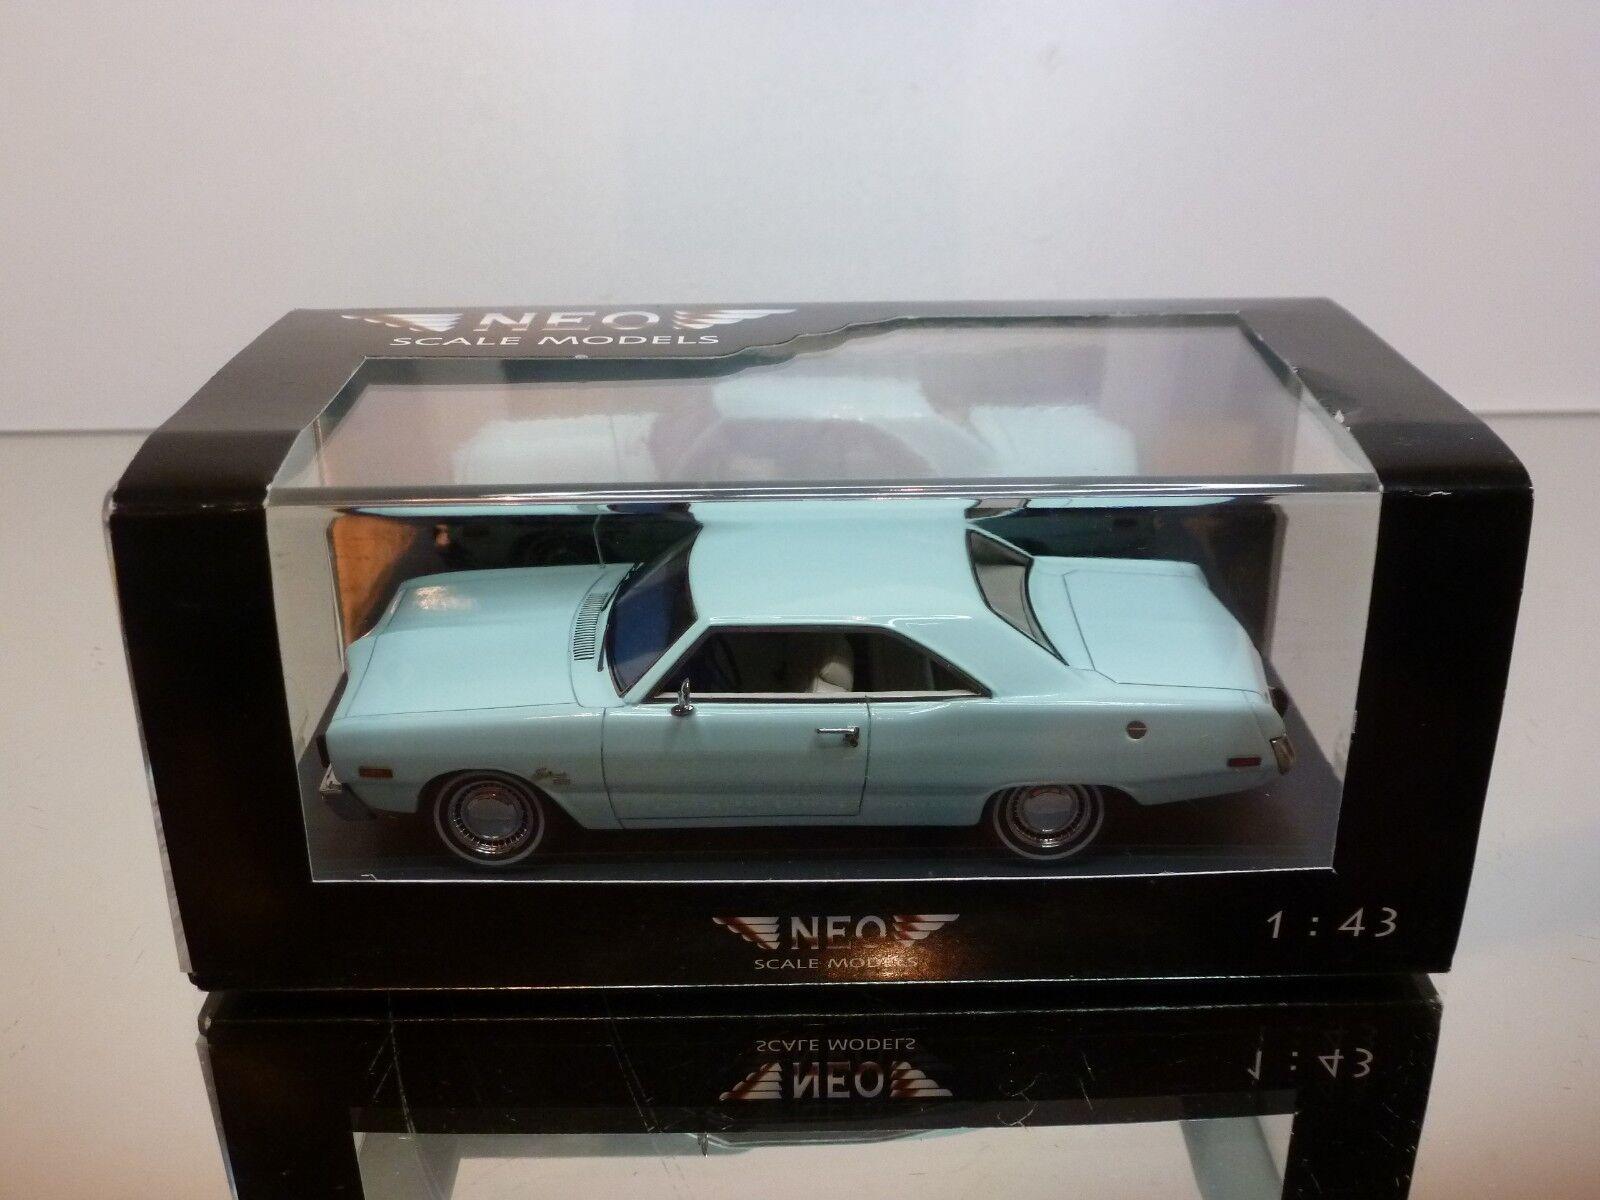 NEO MODELS 44405 DODGE DART SWINGER - LIGHT bleu 1 43 - EXCELLENT IN BOX